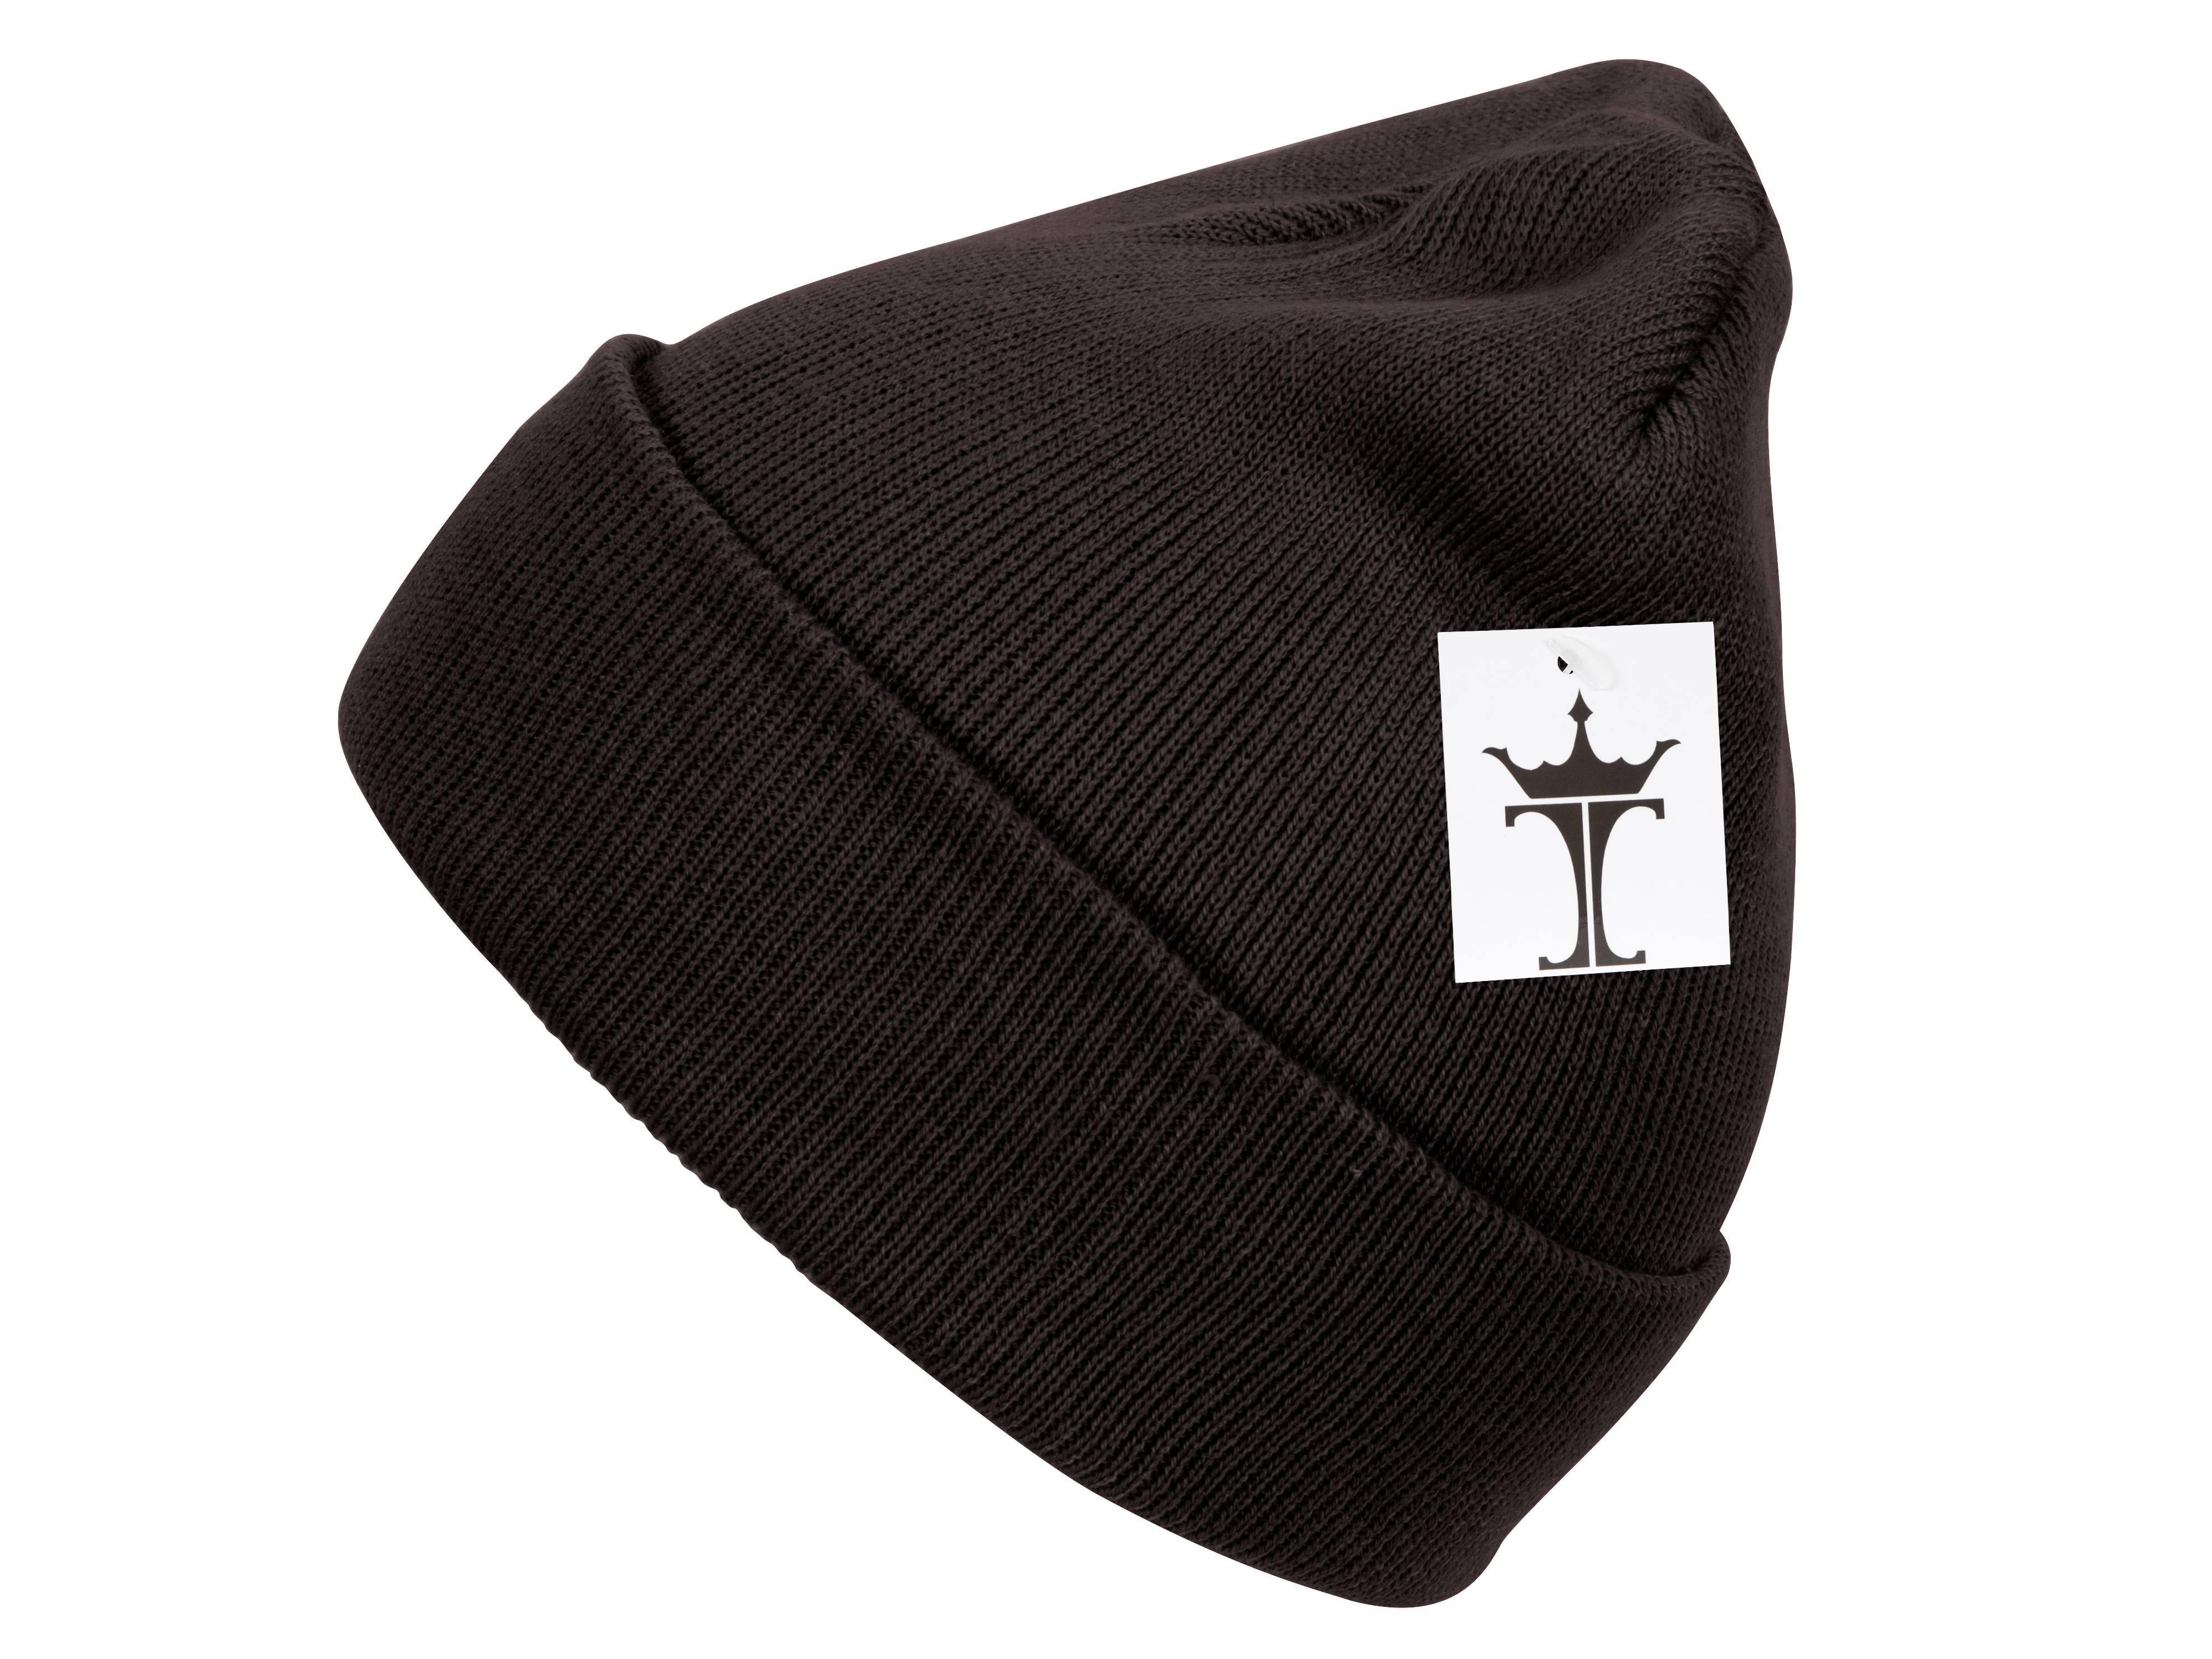 thumbnail 6 - Top Headwear Solid Winter Long Beanie - 12 Piece Wholesale